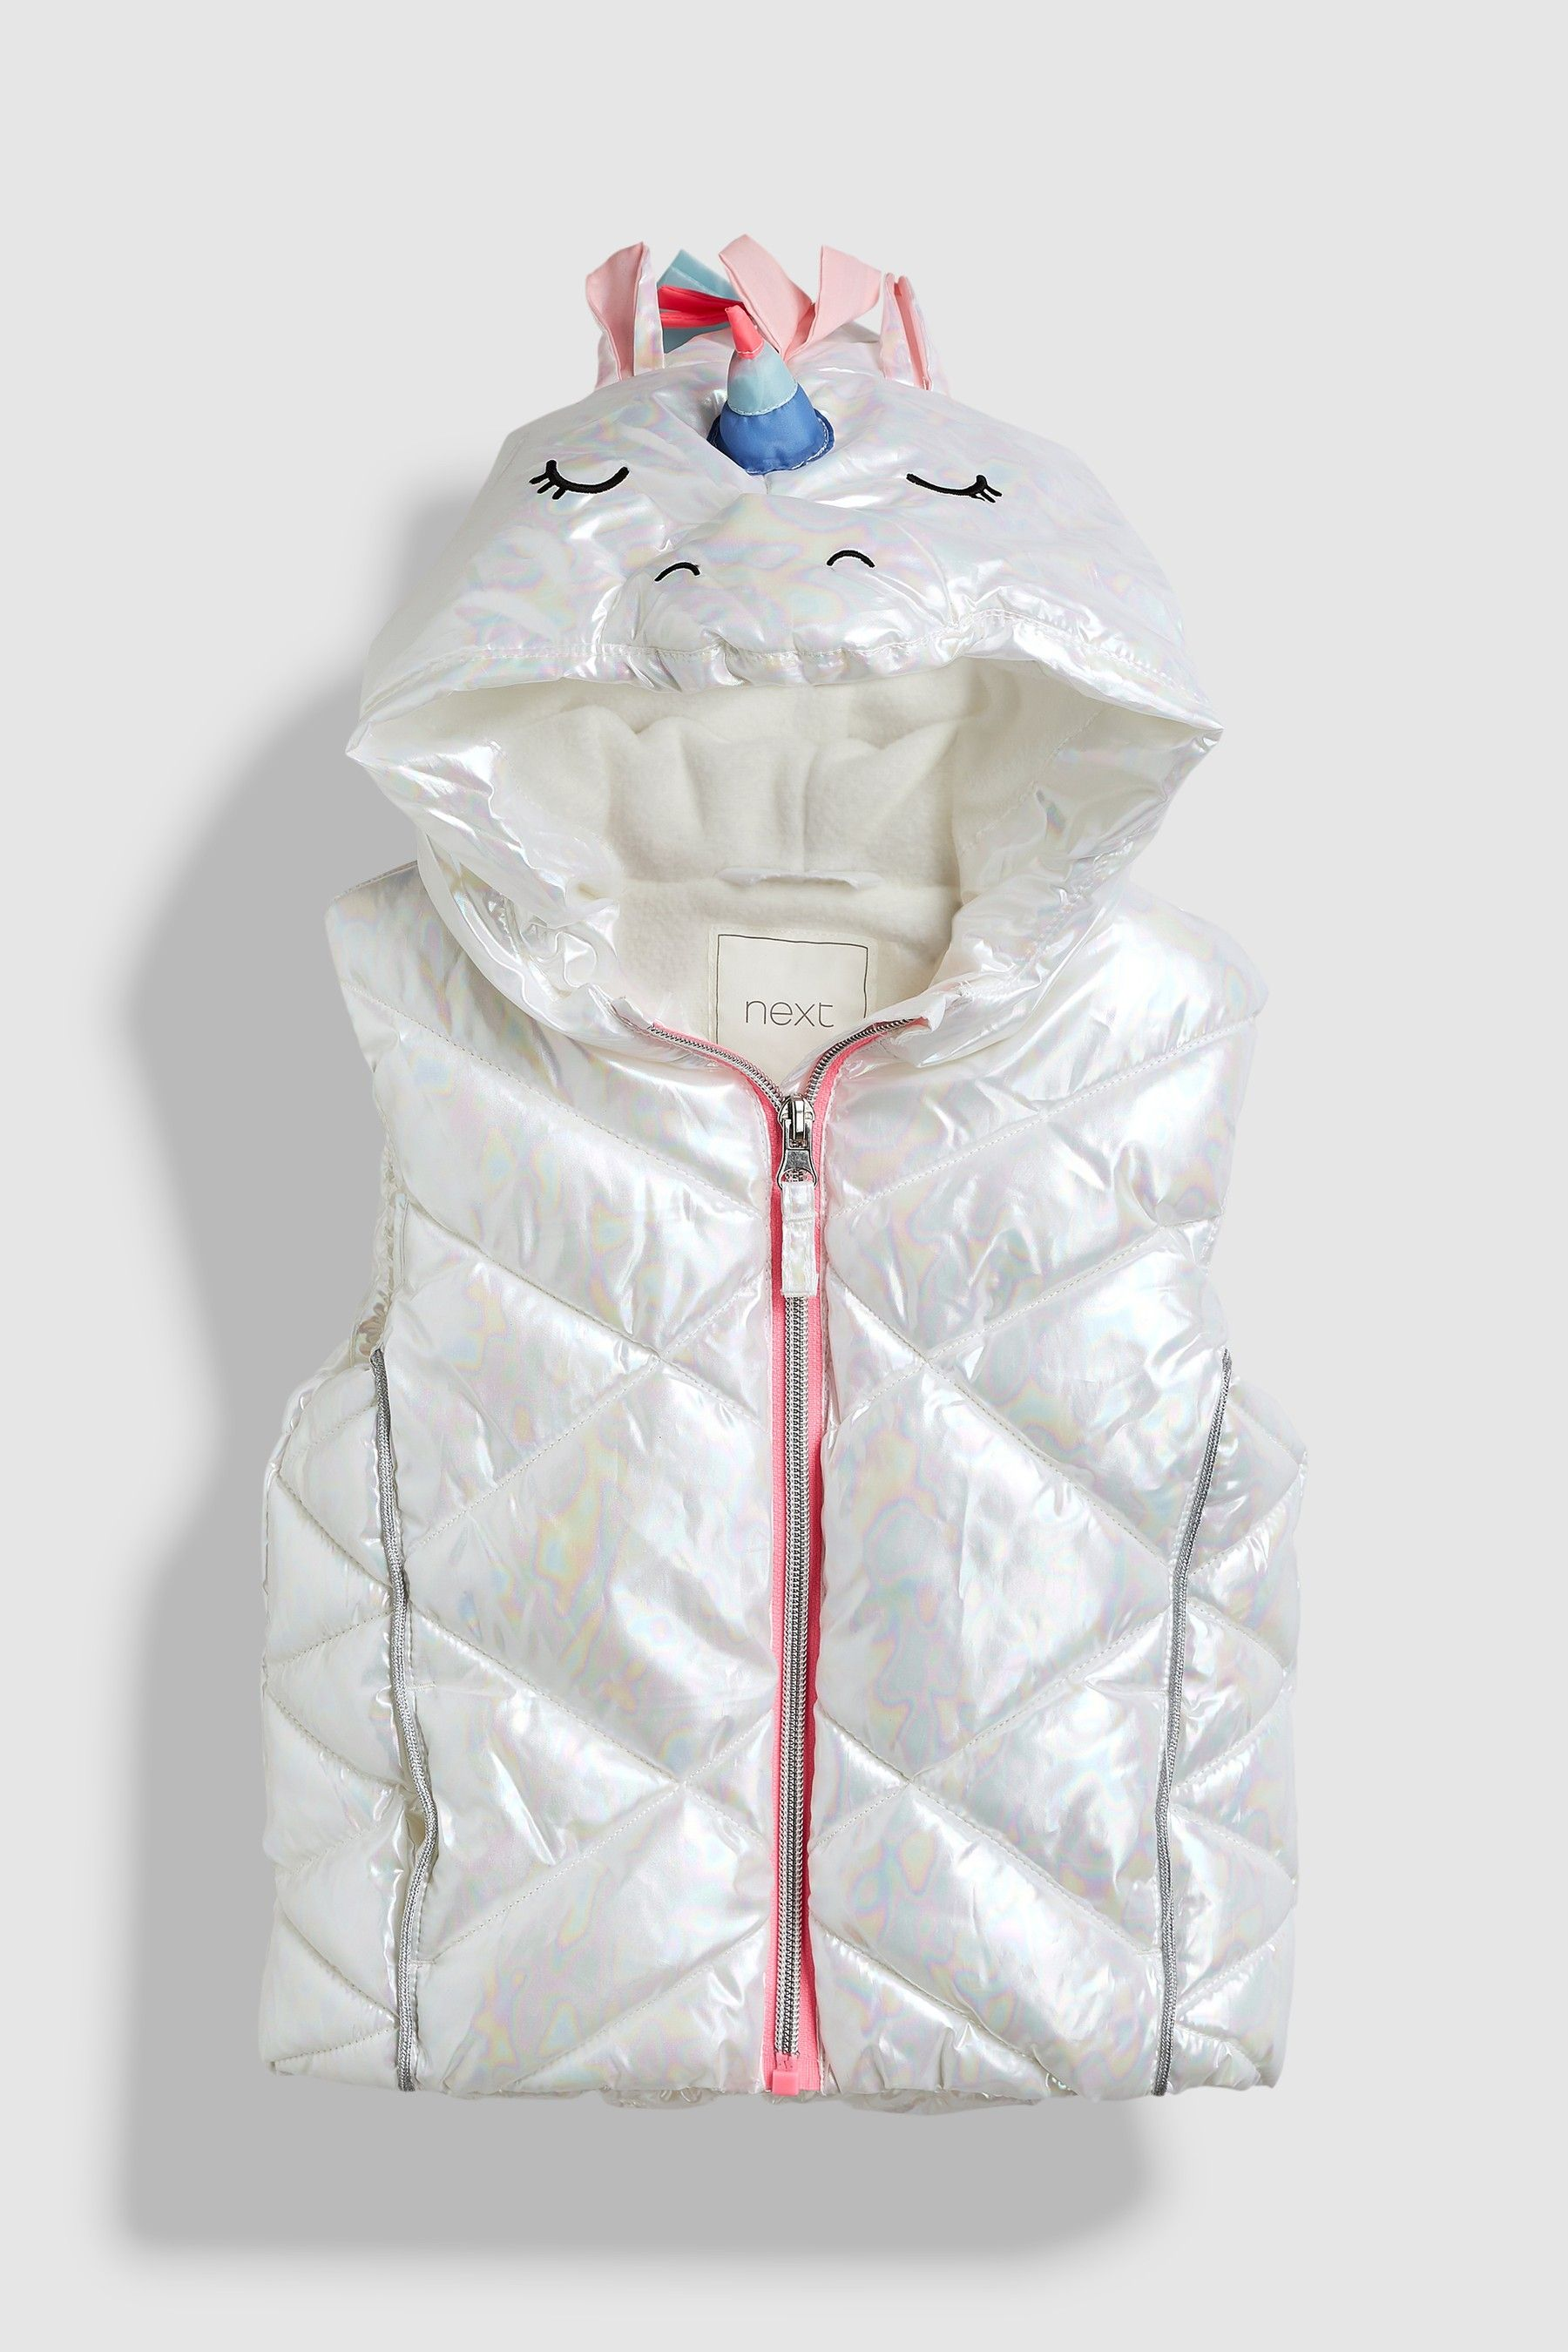 576b9616752cd Girls Next White Unicorn Gilet (3mths-6yrs) - White | Products ...